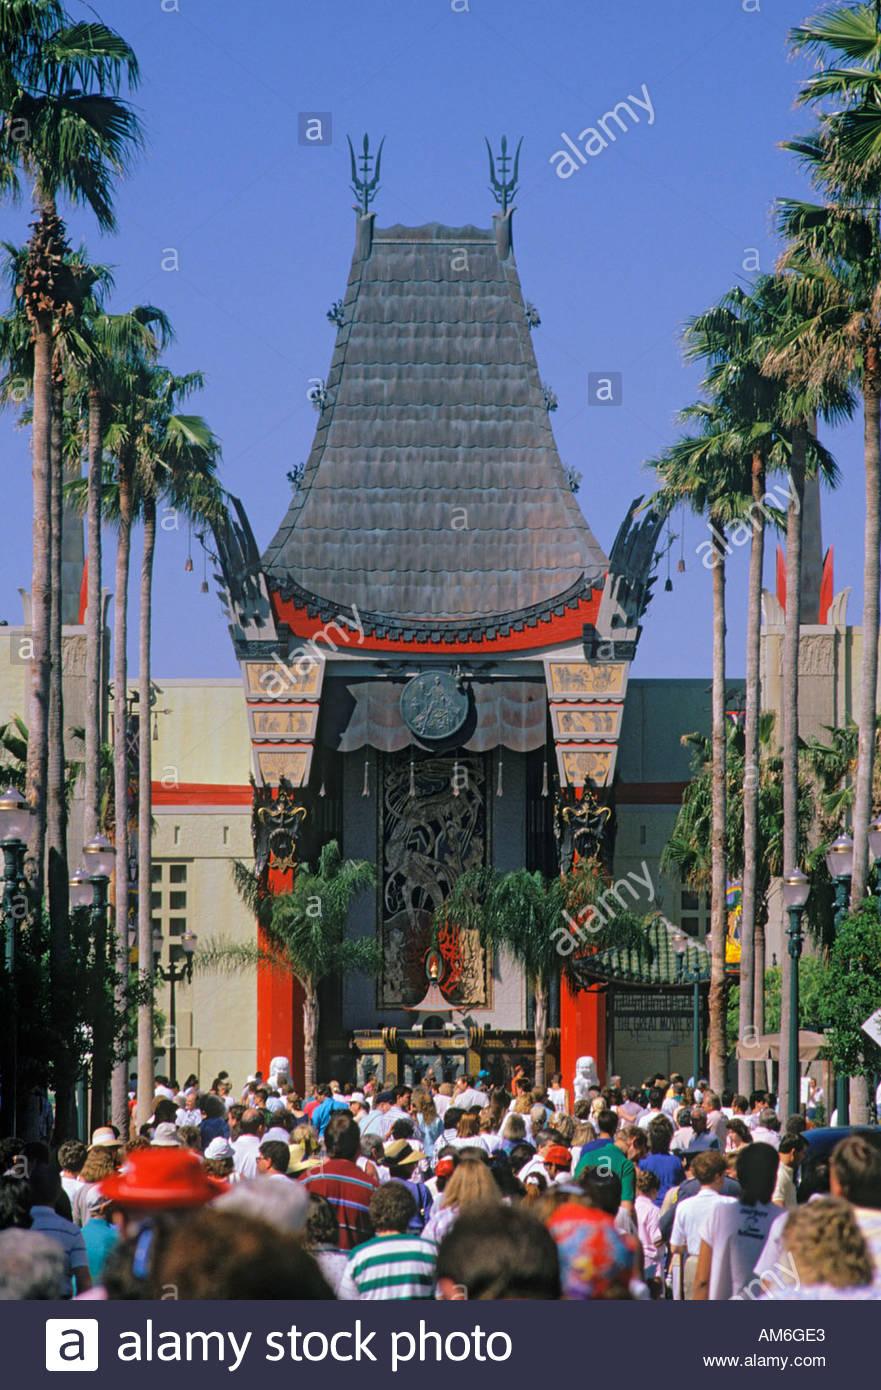 Chinese Theatre At Mgm Studios Walt Disney World Orlando Florida Usa